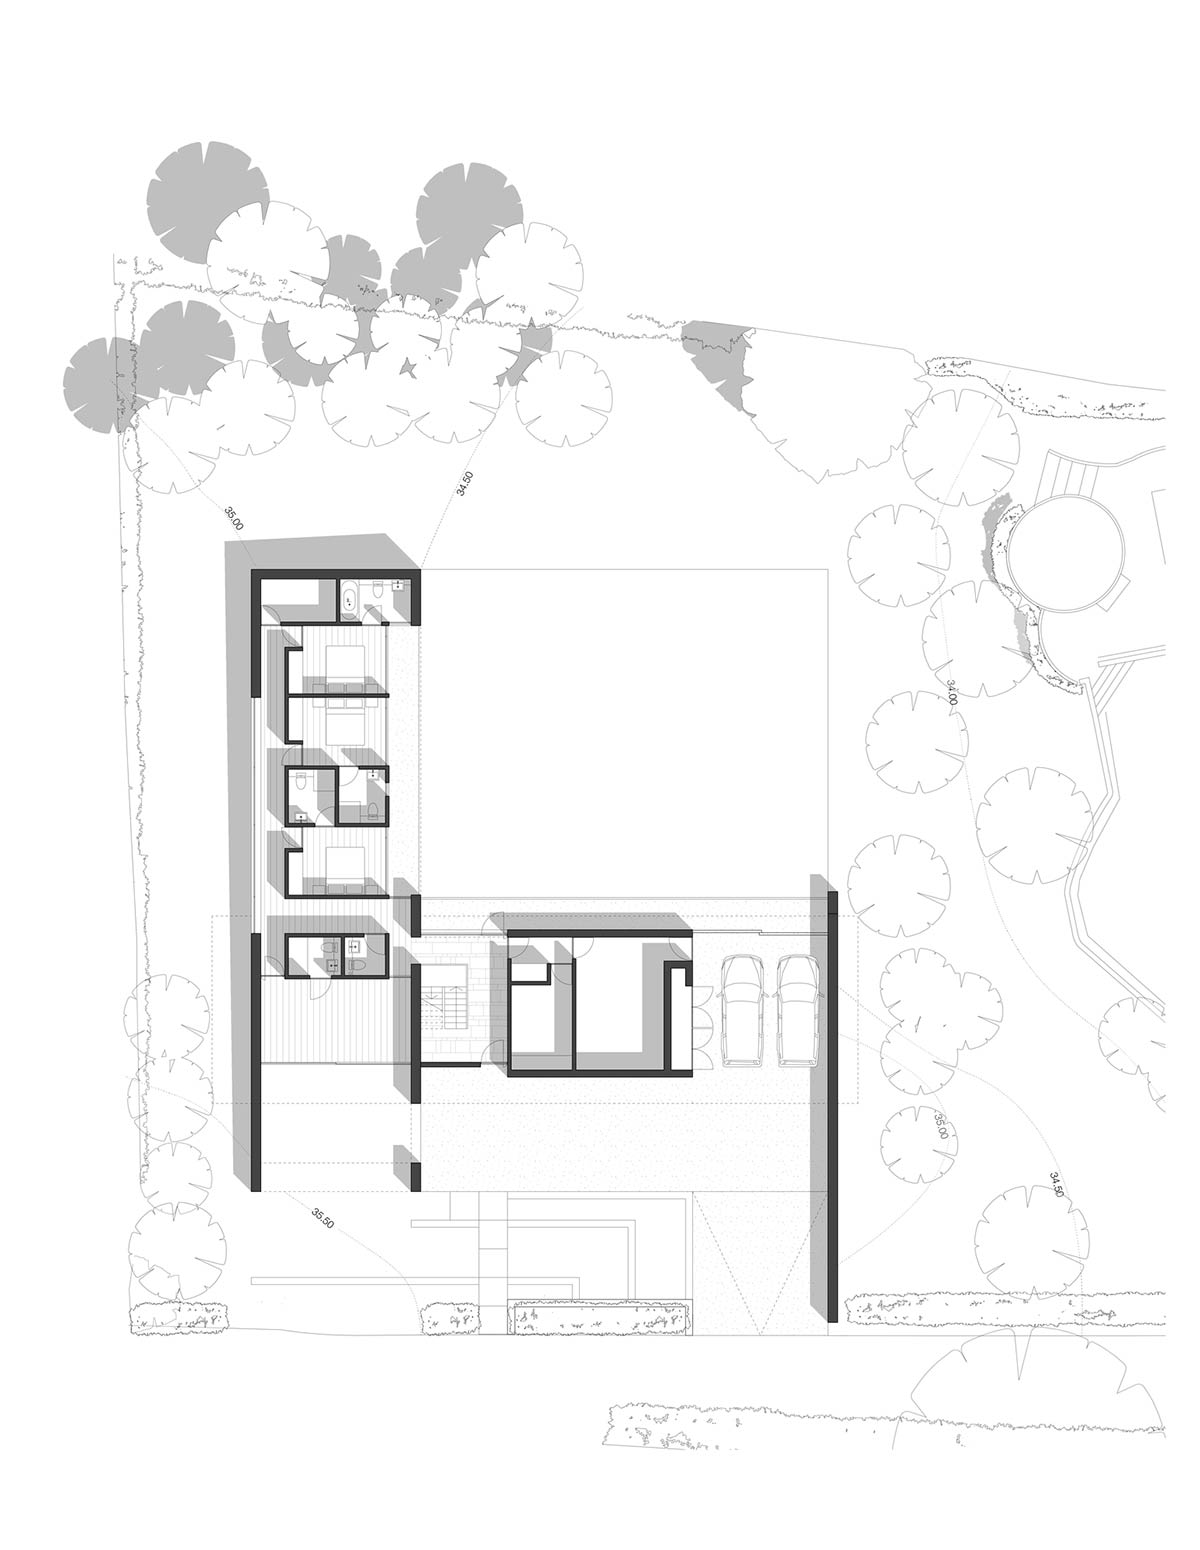 Plan, Hurst House, Buckinghamshire by John Pardey Architects + Strom Architects